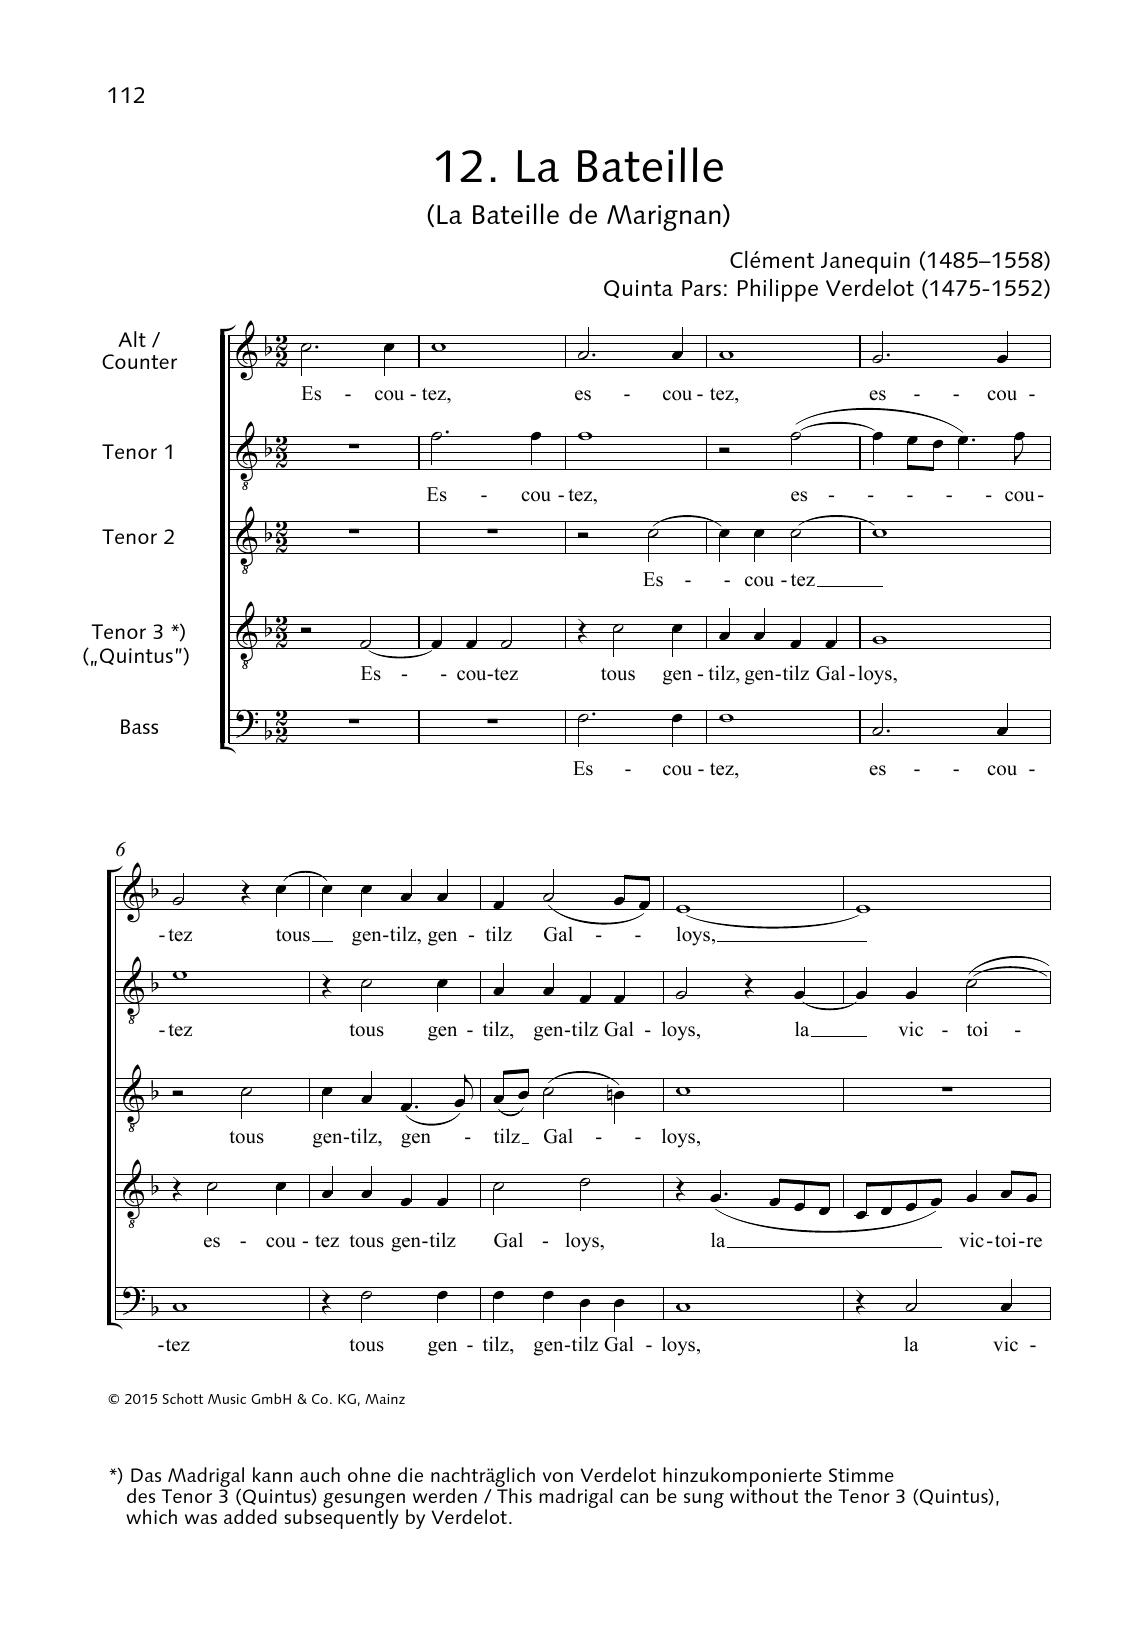 La Bateille de Marignan Sheet Music